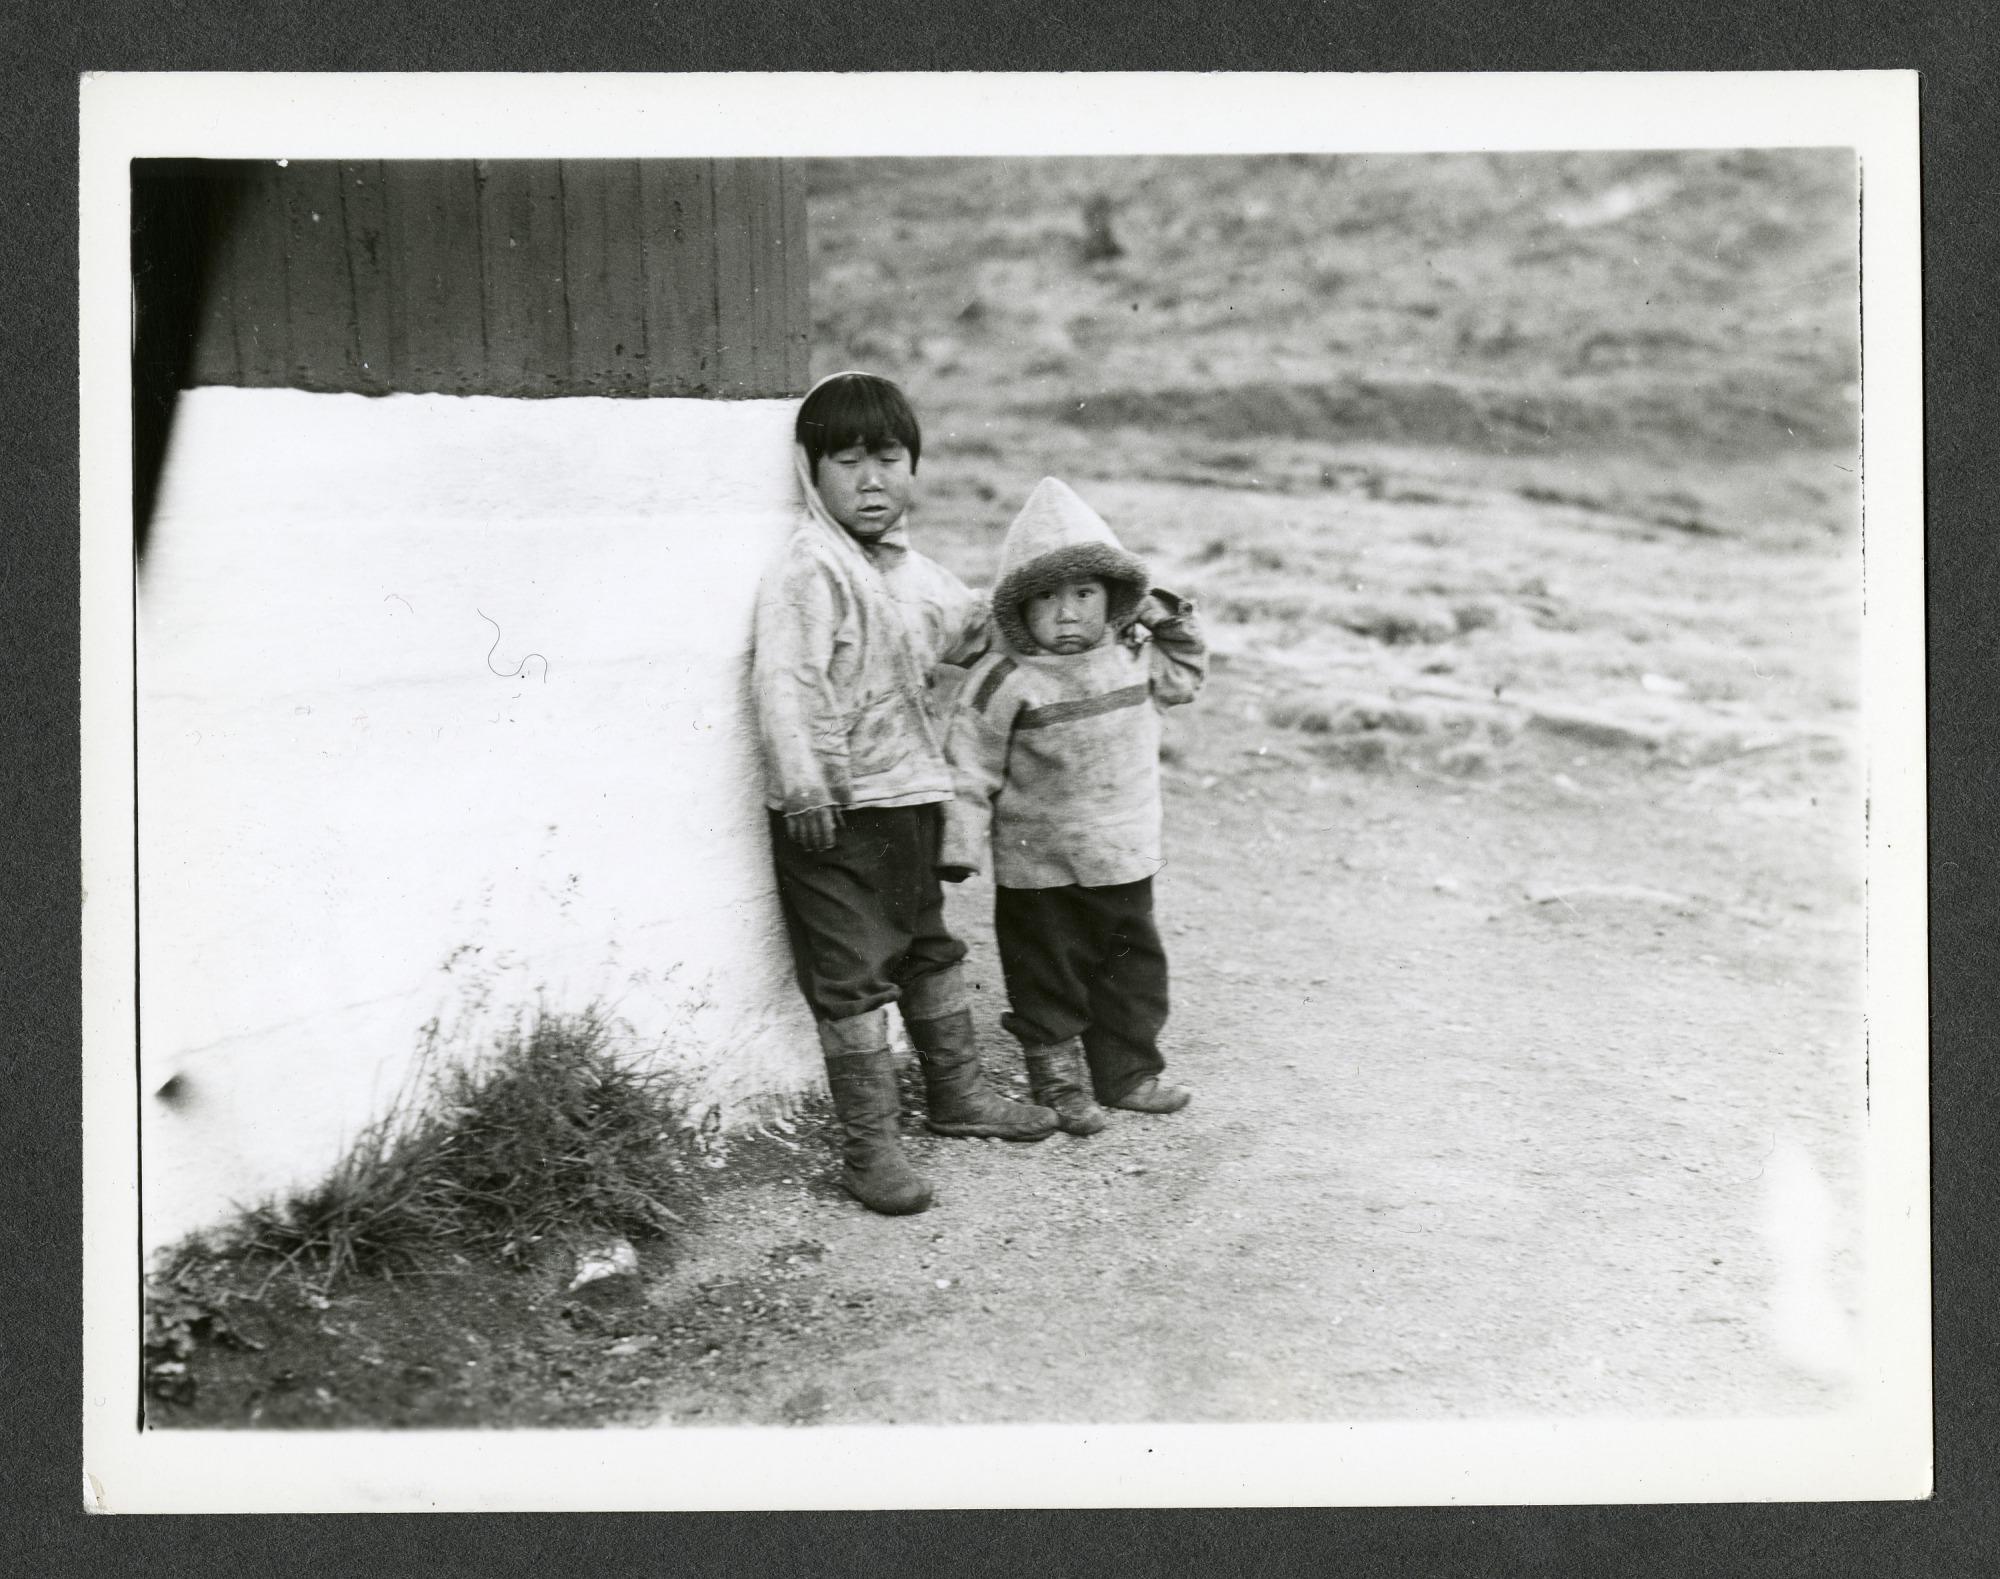 Indigenous children in Ammassalik [Tasiilaq], Greenland, 1936